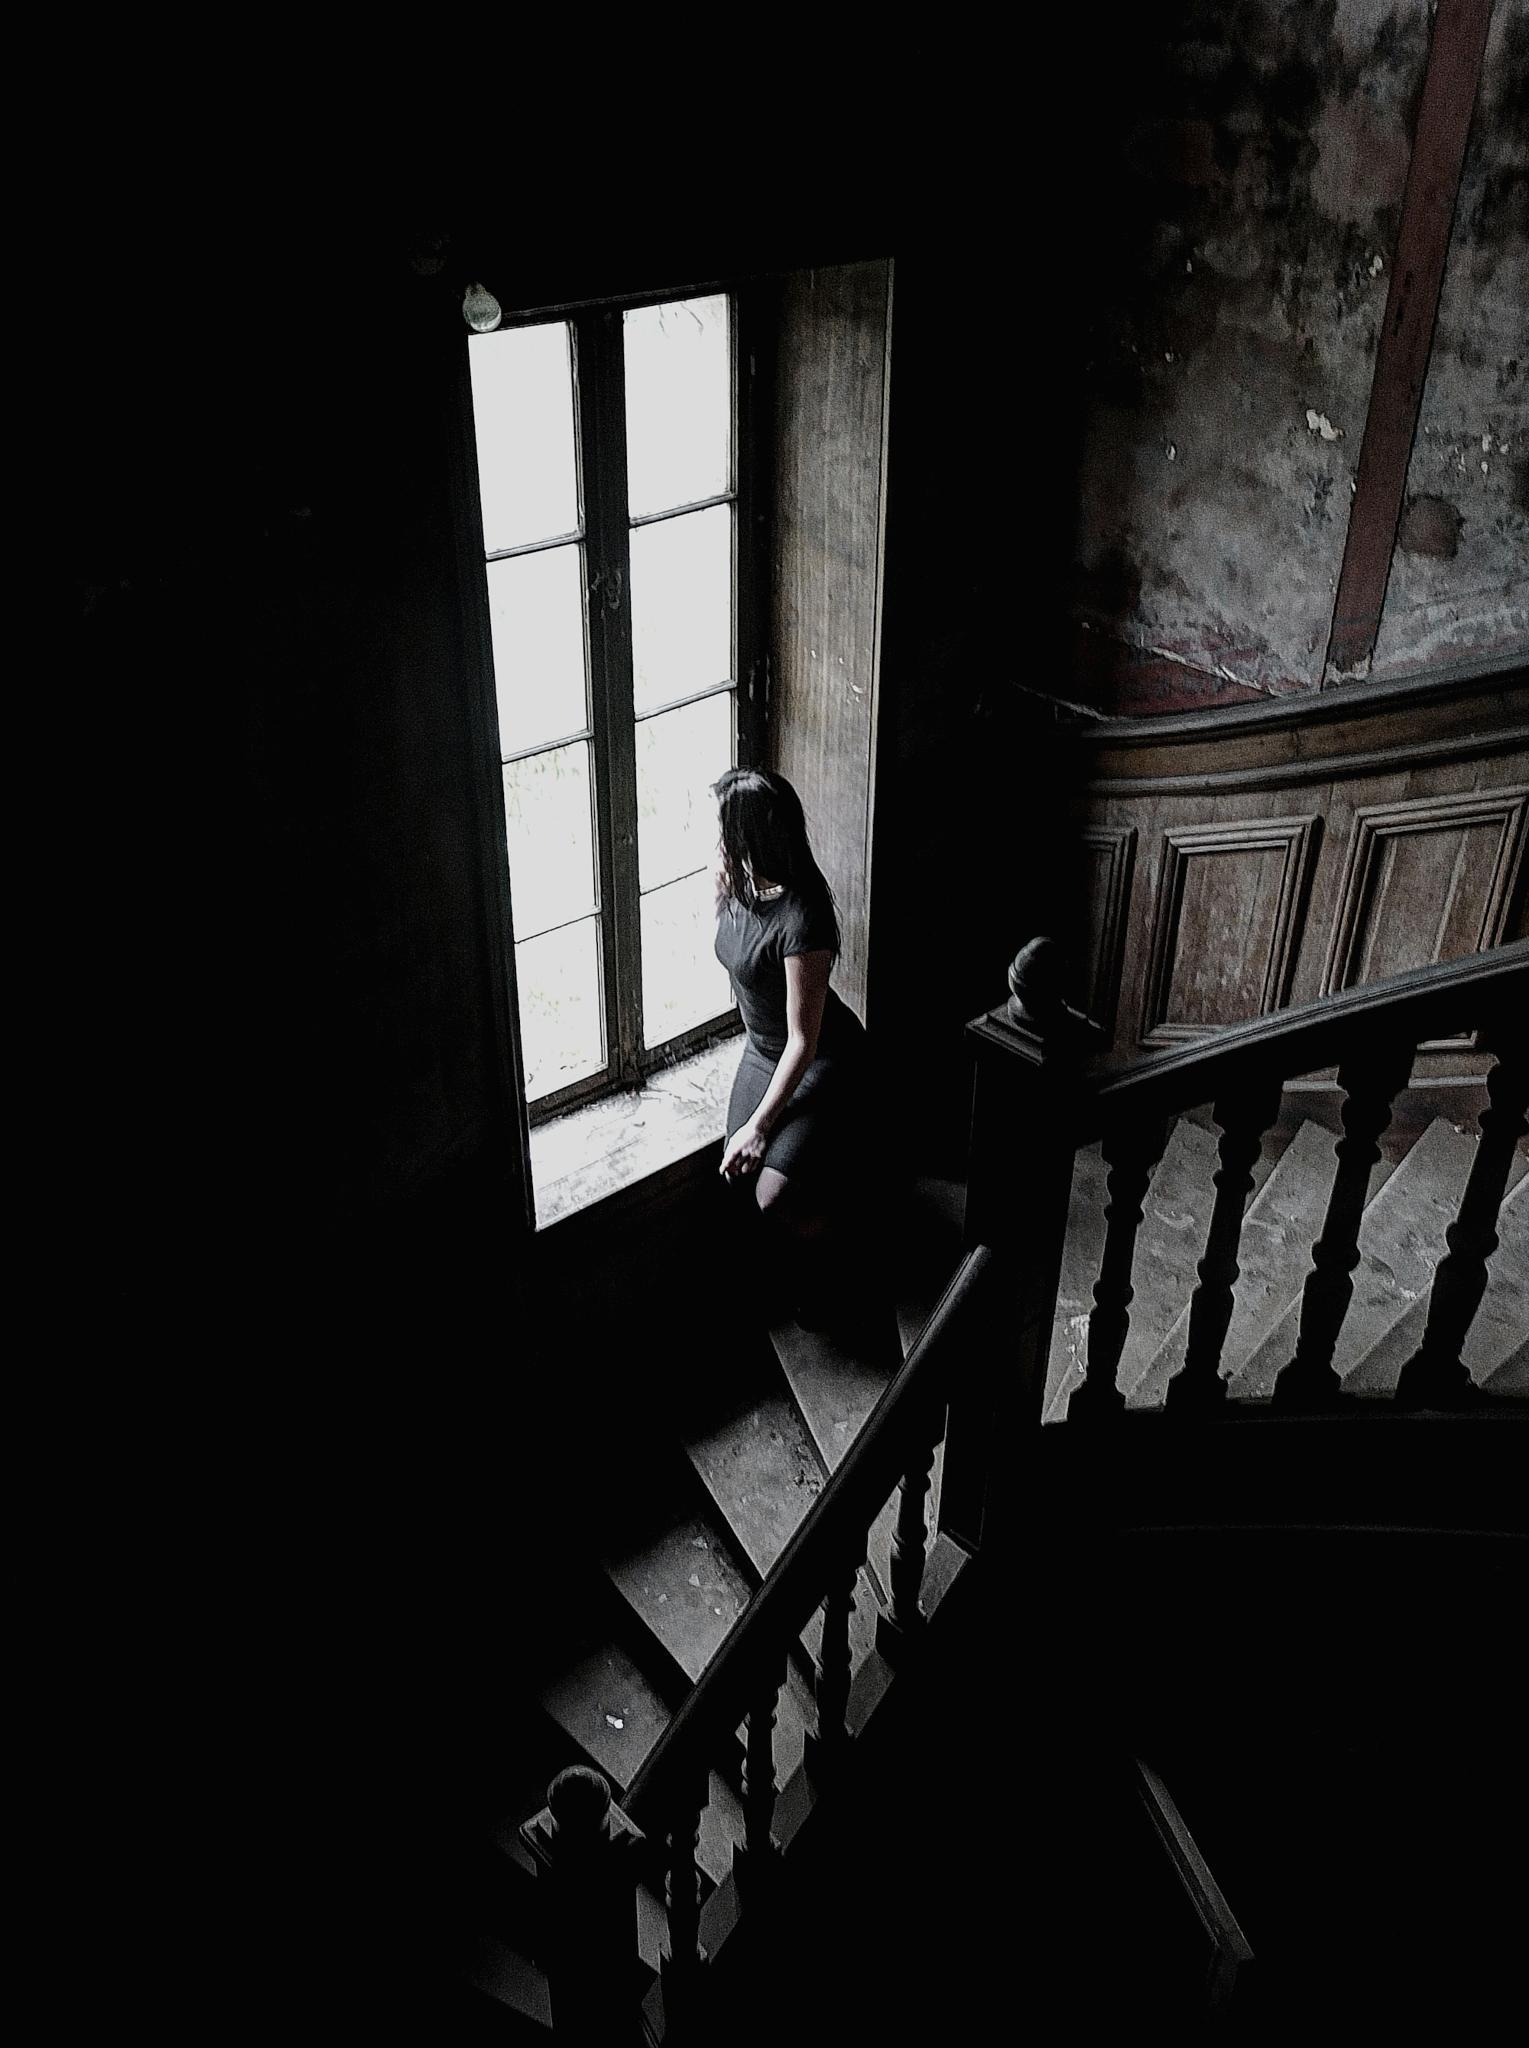 A la fenêtre... by WilKaza